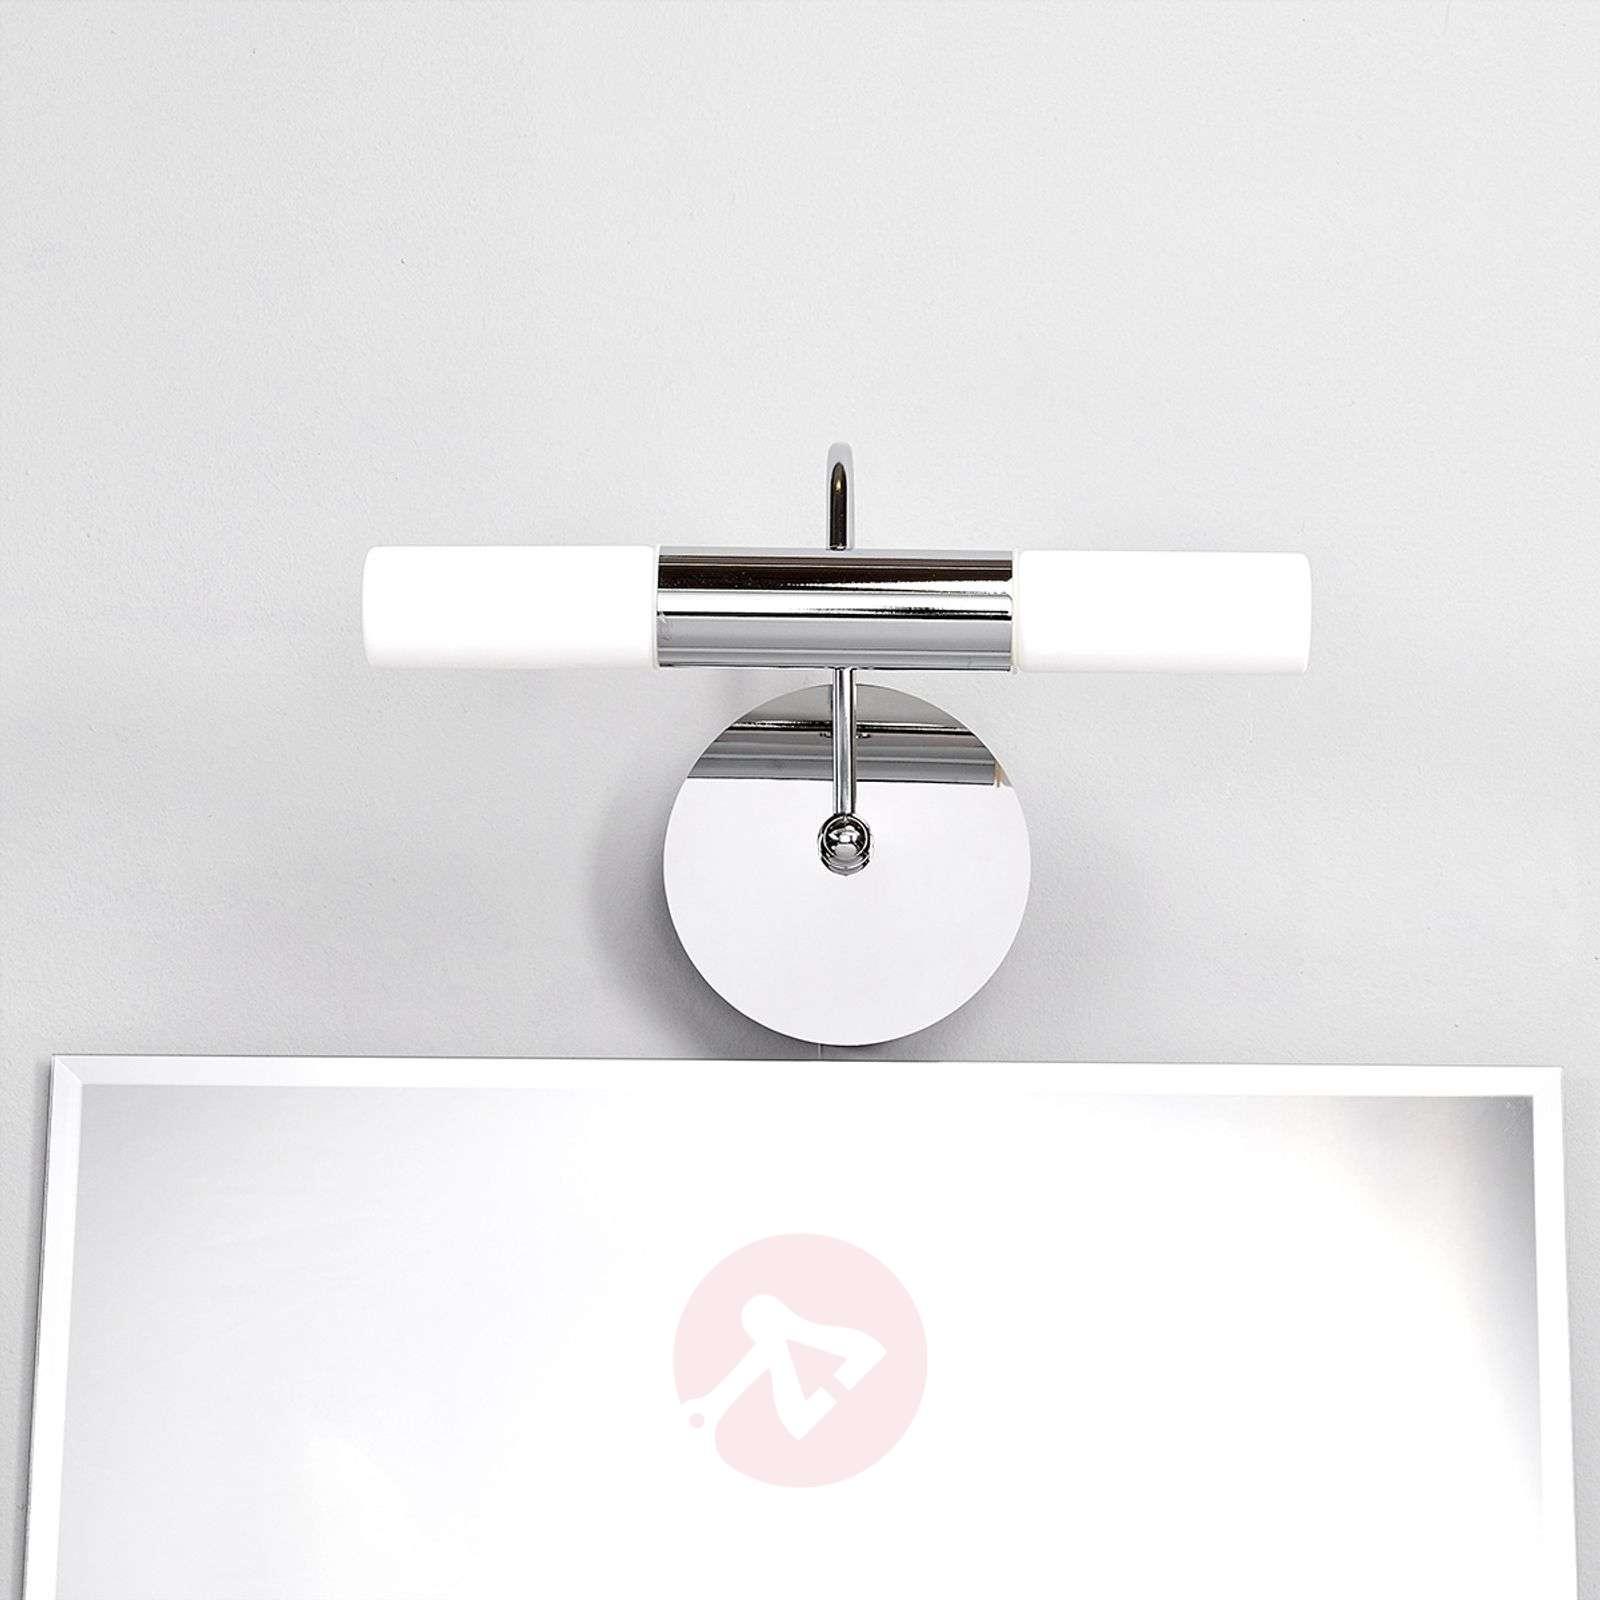 Curved Benaja LED wall light for bathroom-9994007-01